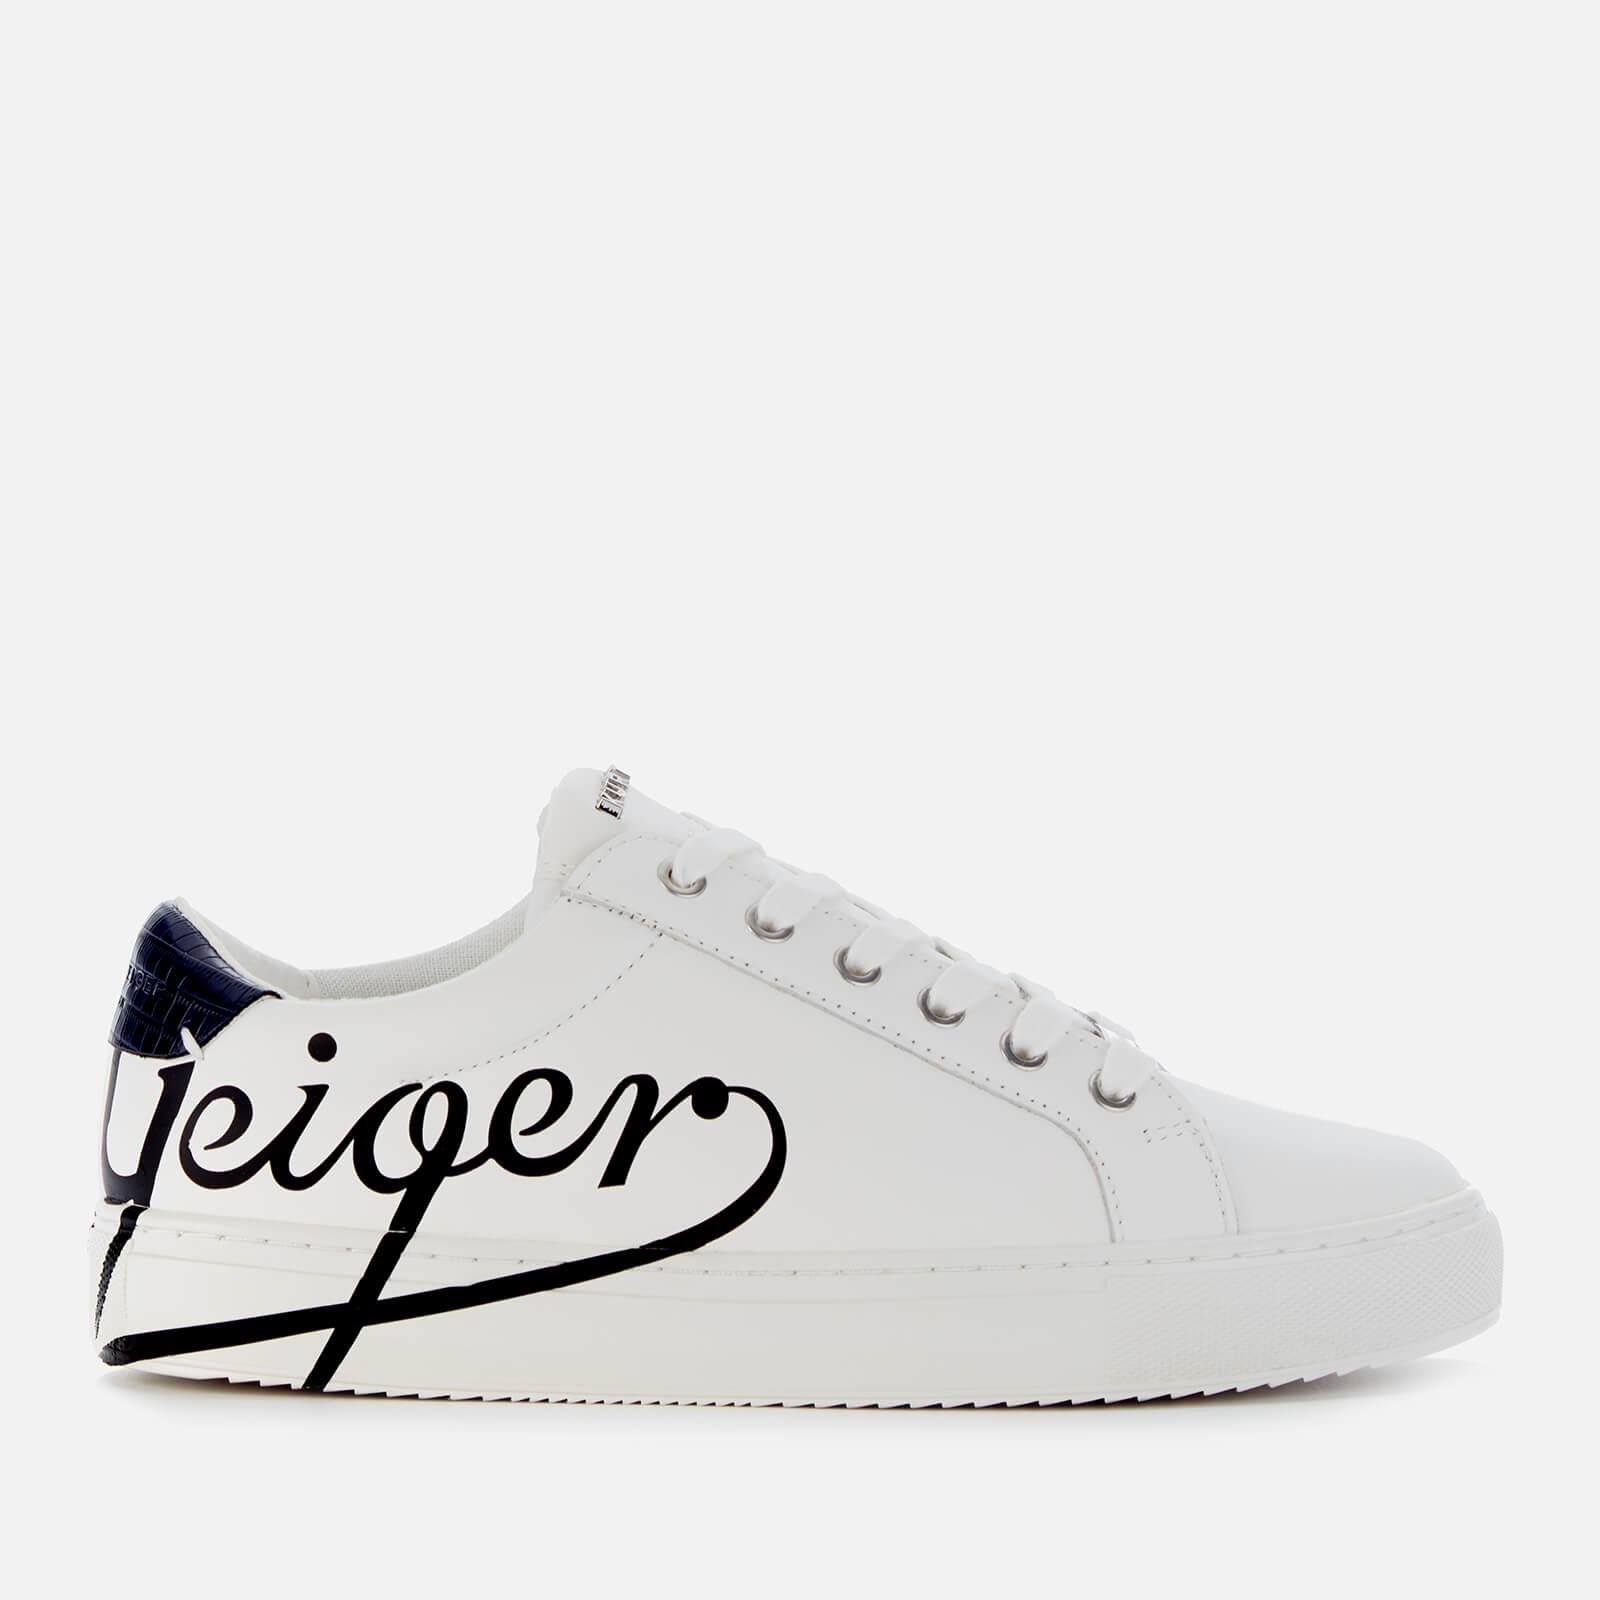 Kurt Geiger London Women's Liza Geiger Leather Cupsole Trainers - White/Black - UK 7 - White